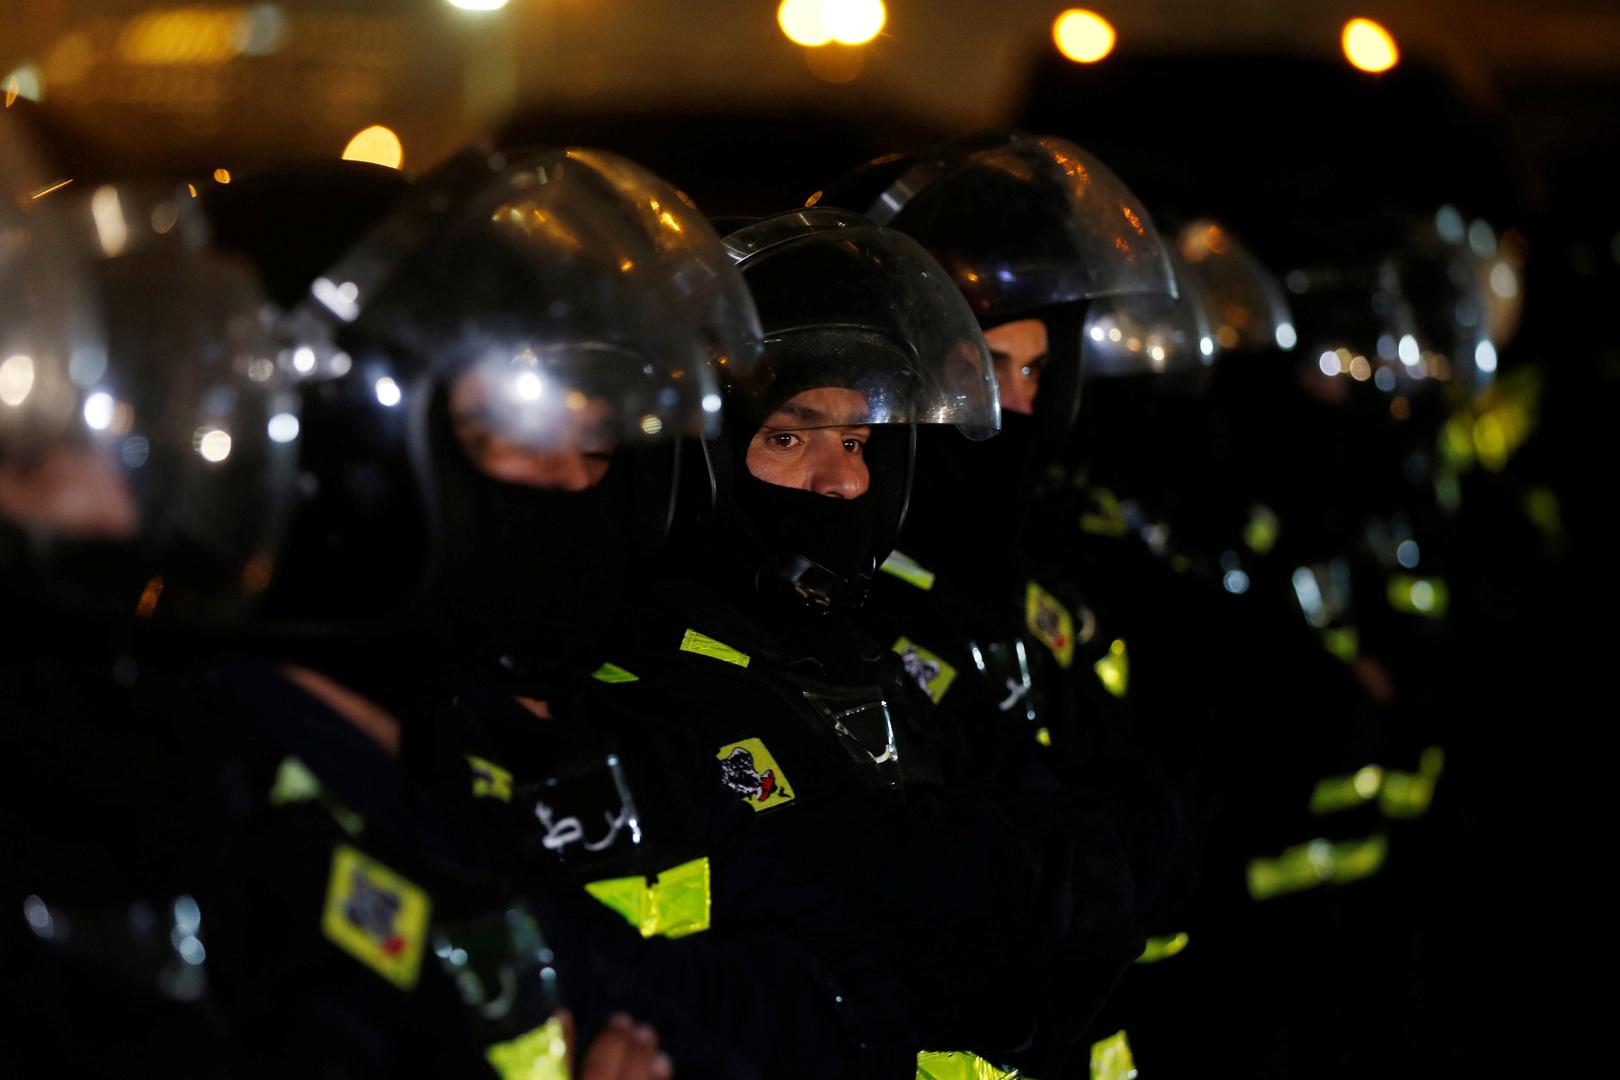 Jordan .. Arrest of an officer and police officers